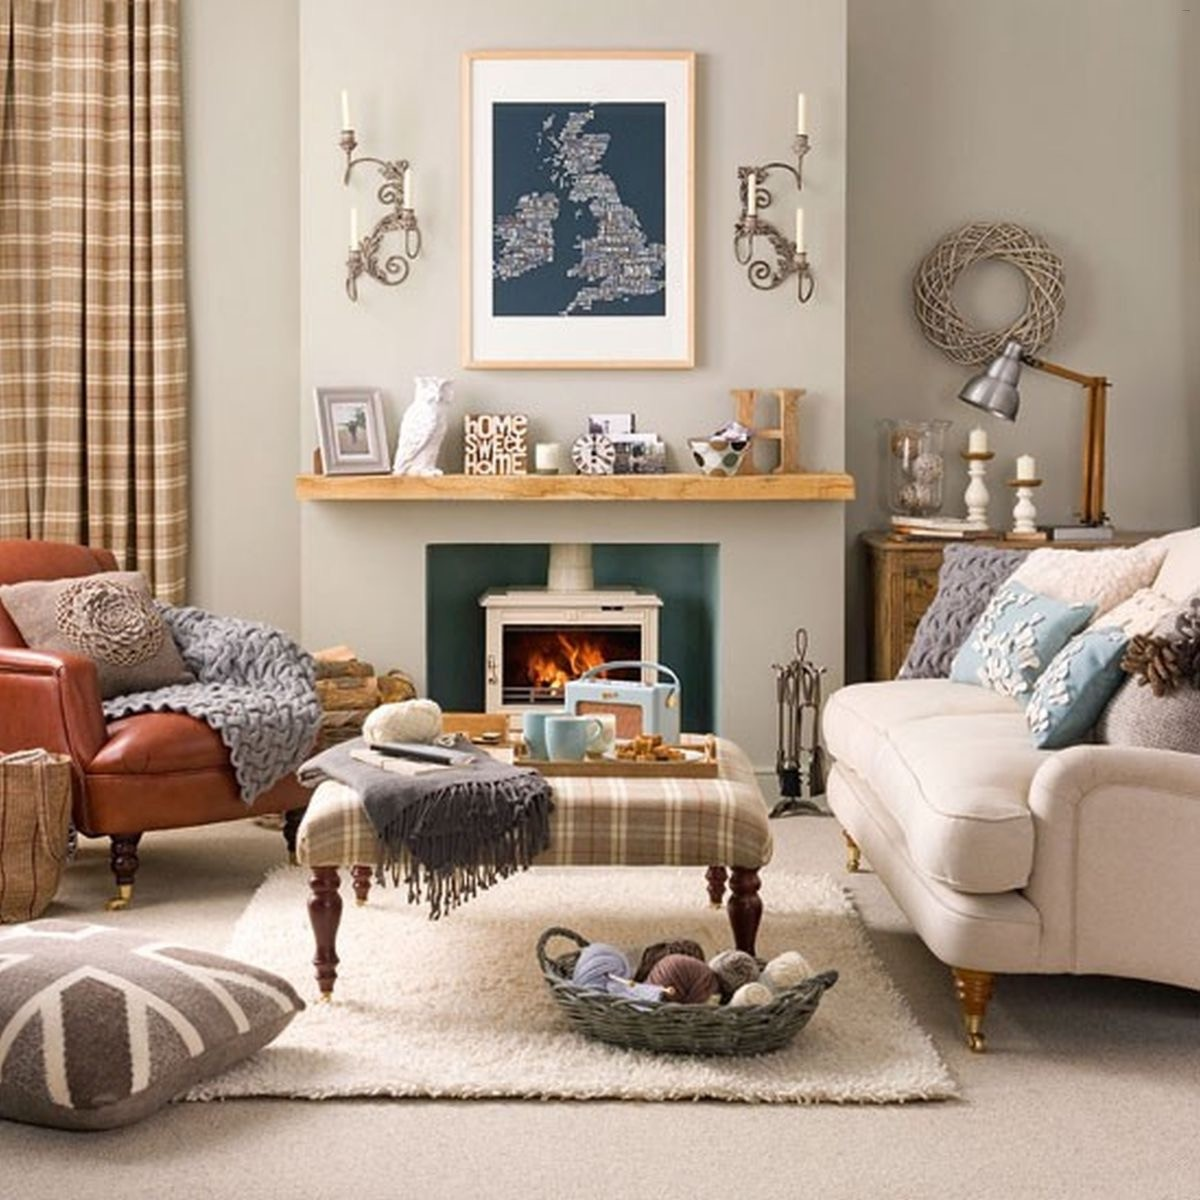 1525361752-cosy-modern-living-room-ideas-interior-paint-colors-2017-of-cosy-modern-living-room-ideas.jpg